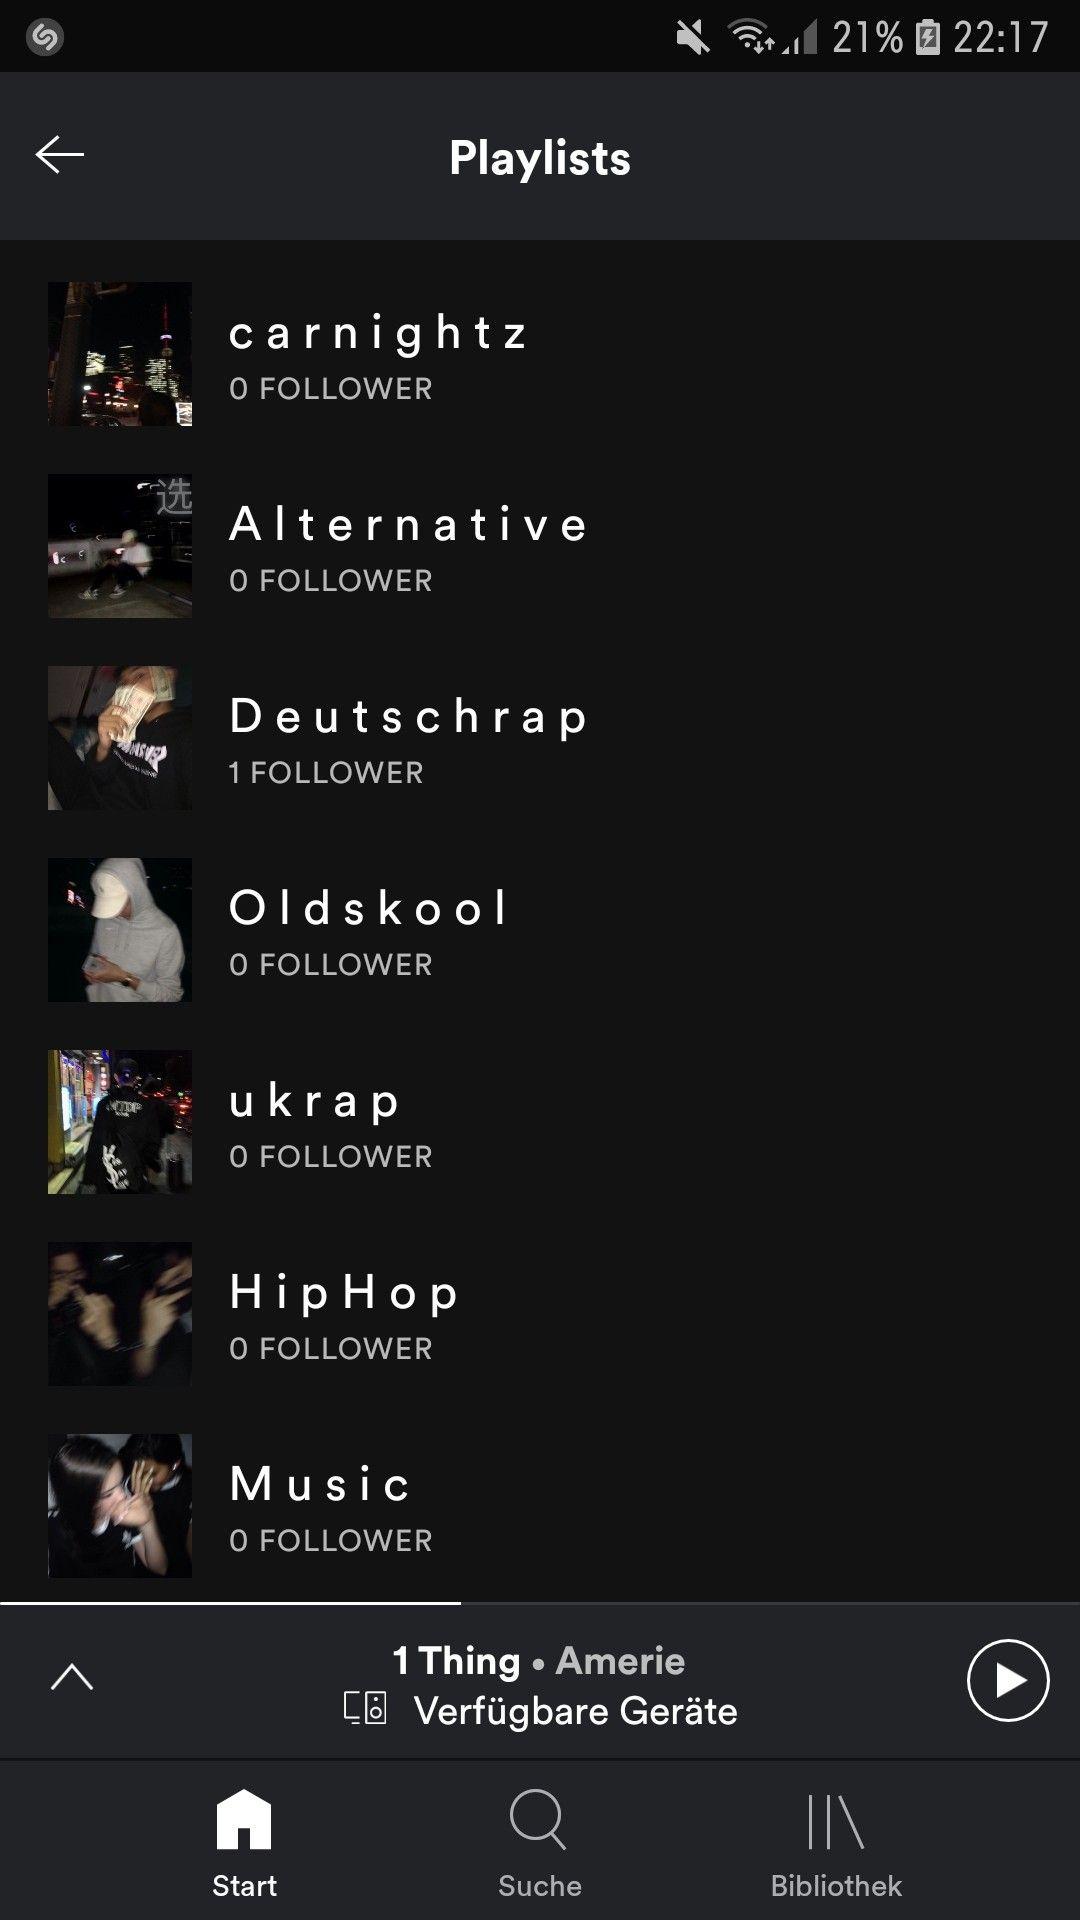 spotify soophiiee xo   Playlist names ideas, Spotify, Song playlist